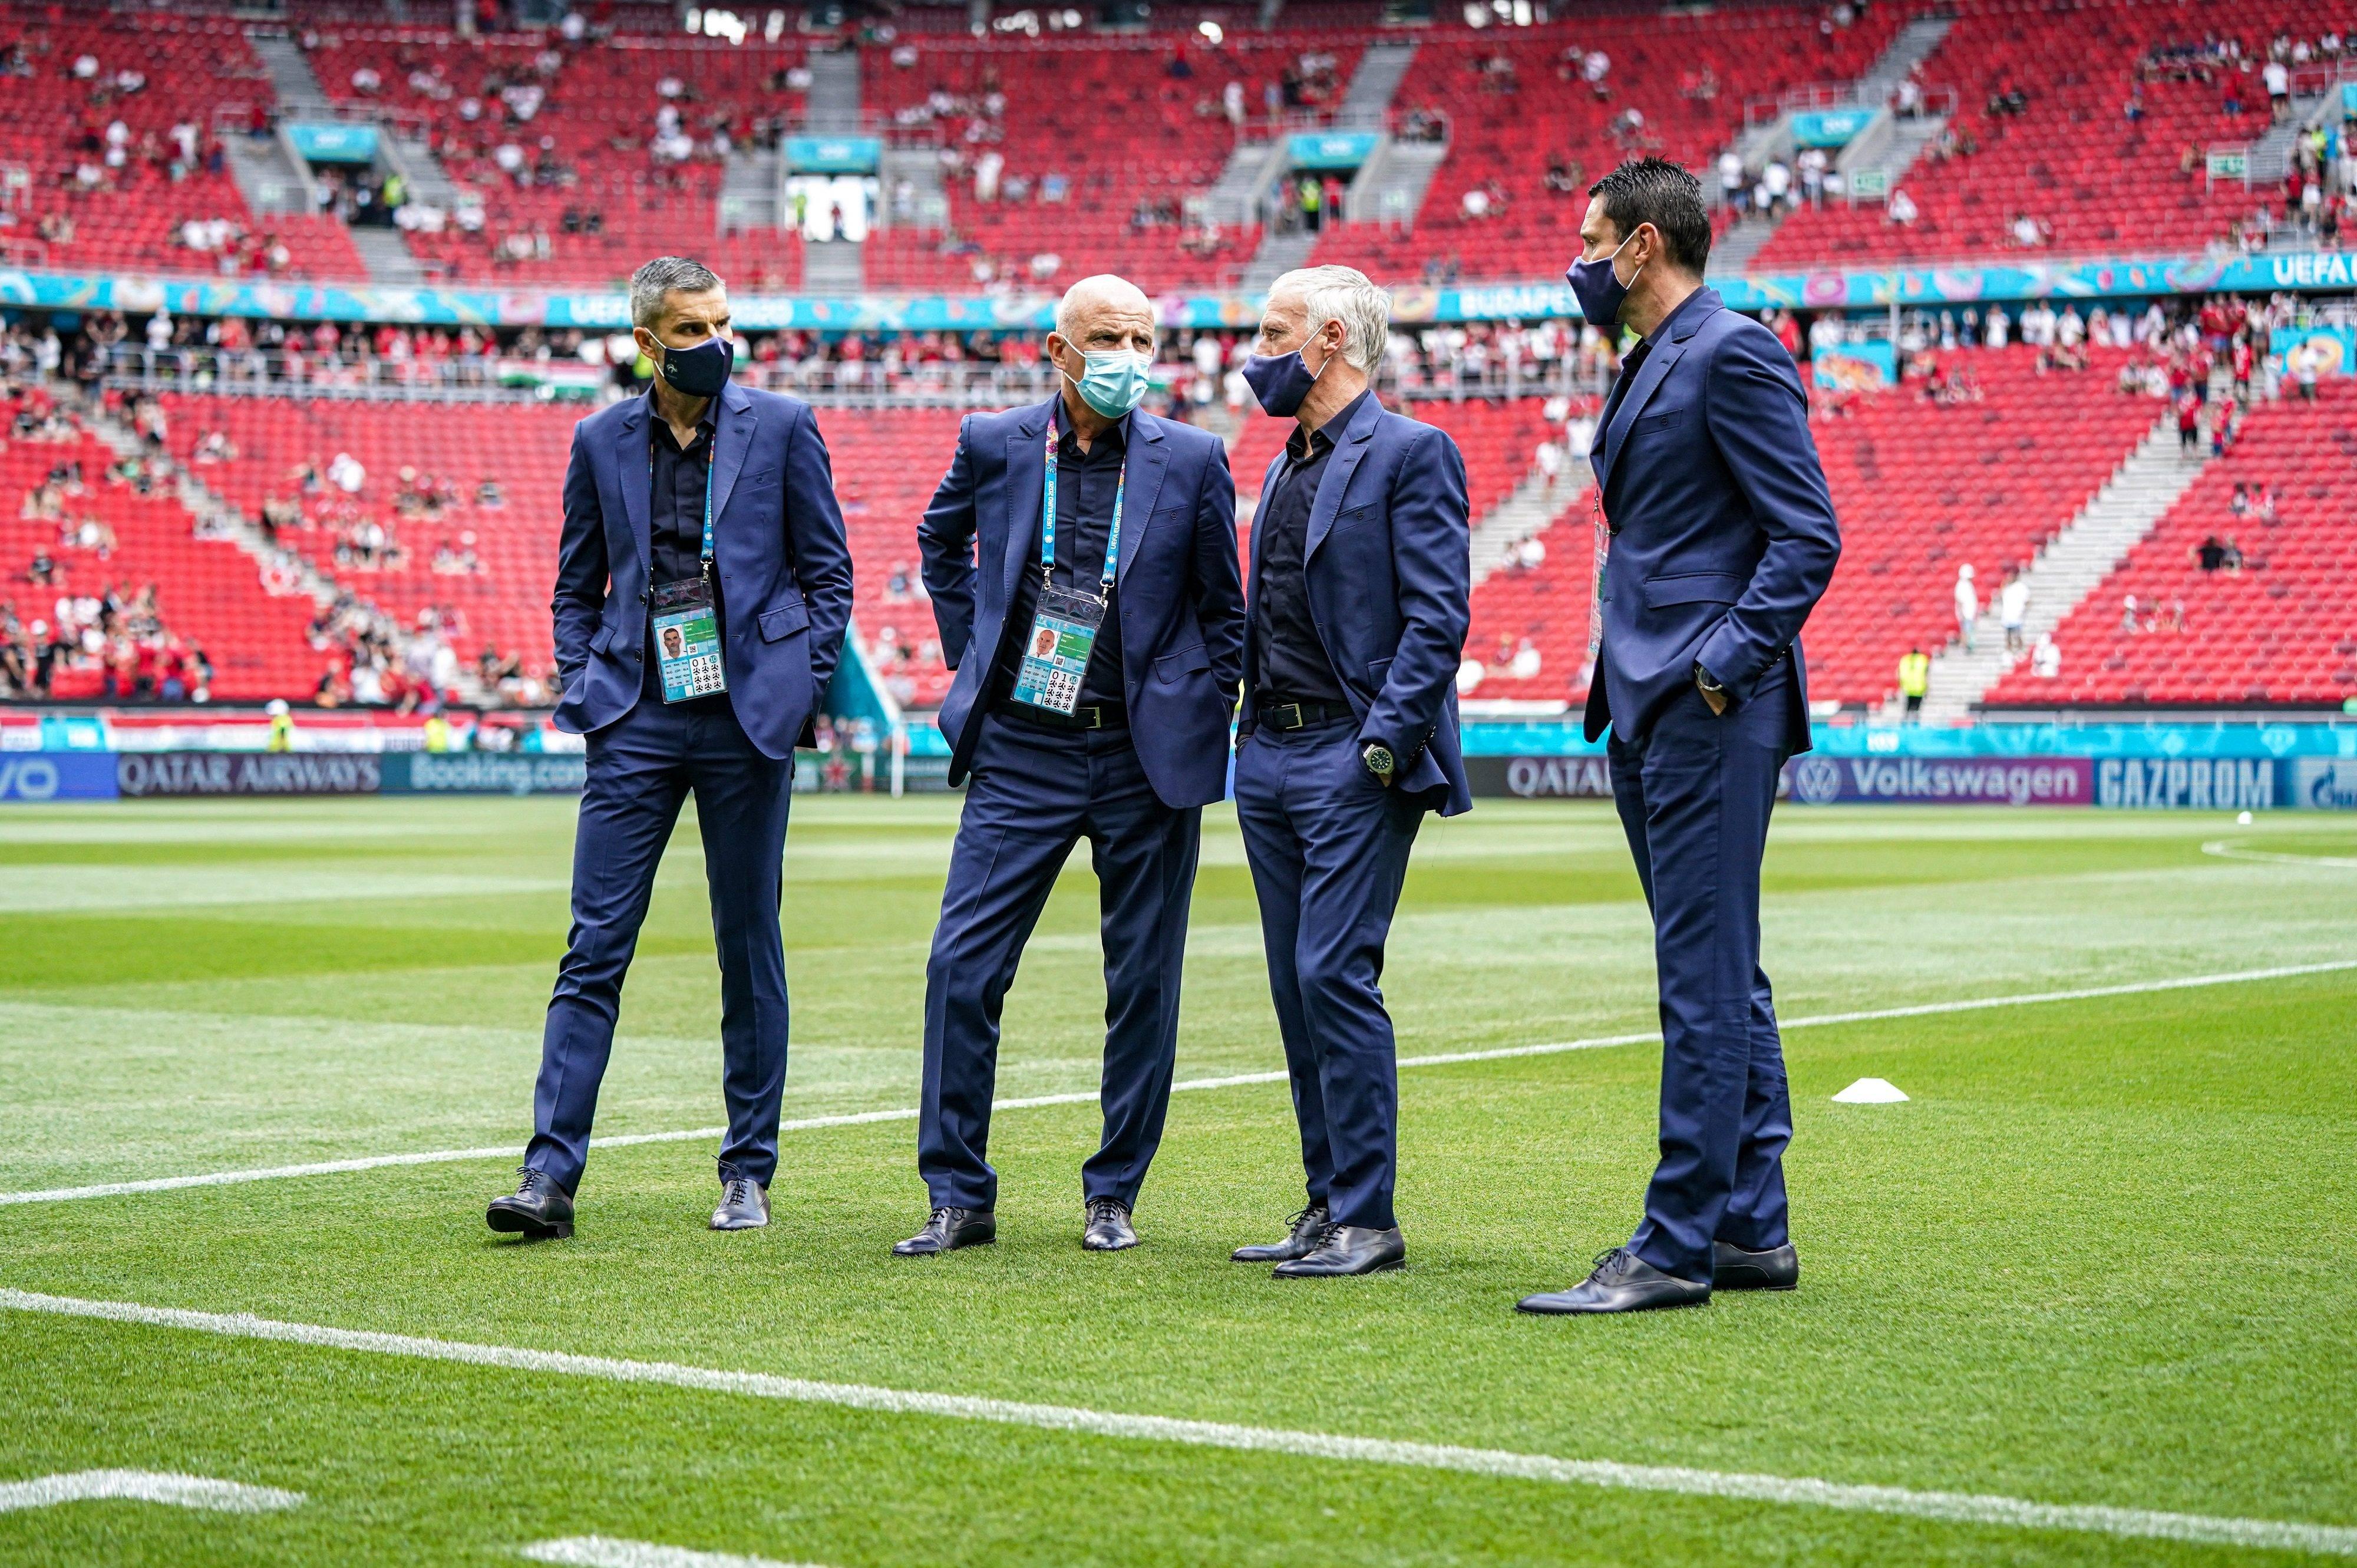 Cyril Moine, Guy Stéphan, Didier Deschamps et Franck Raviot